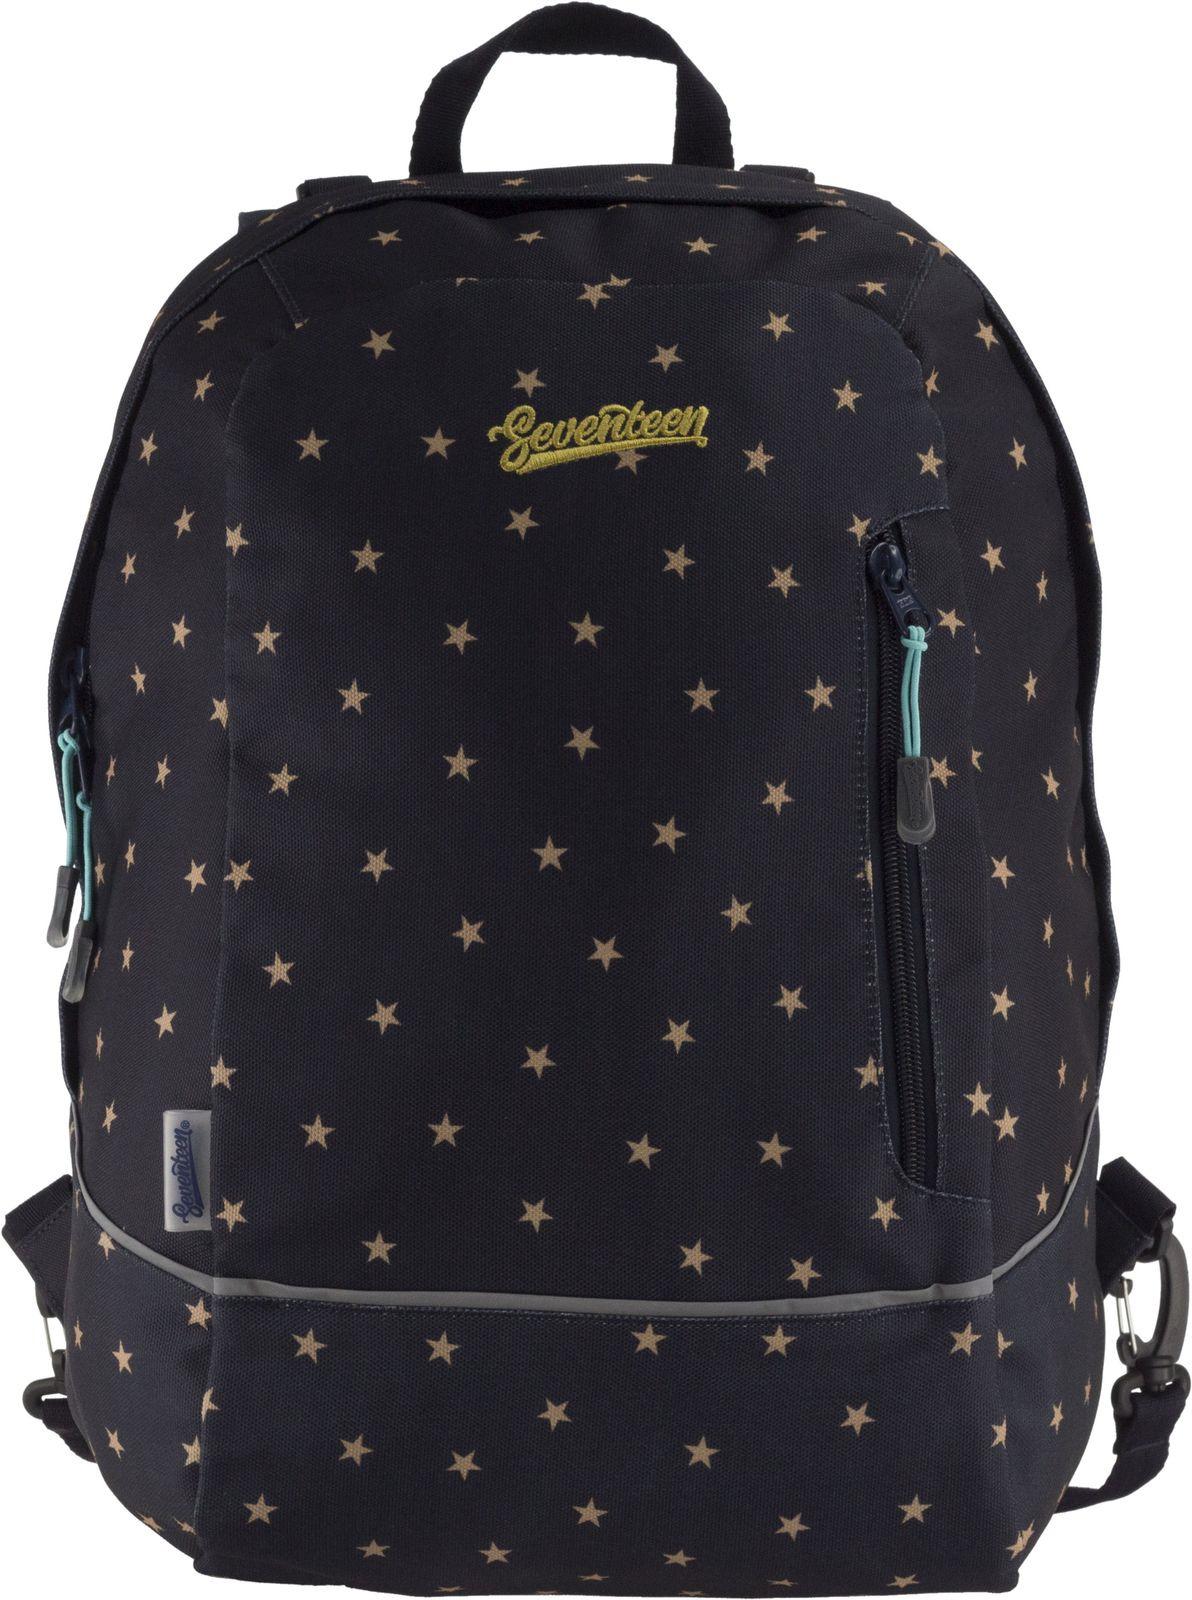 Рюкзак детский Seventeen Звезды, SVGB-RTD-675TW, мультиколорбежевый, 43 x 32 x 19 см